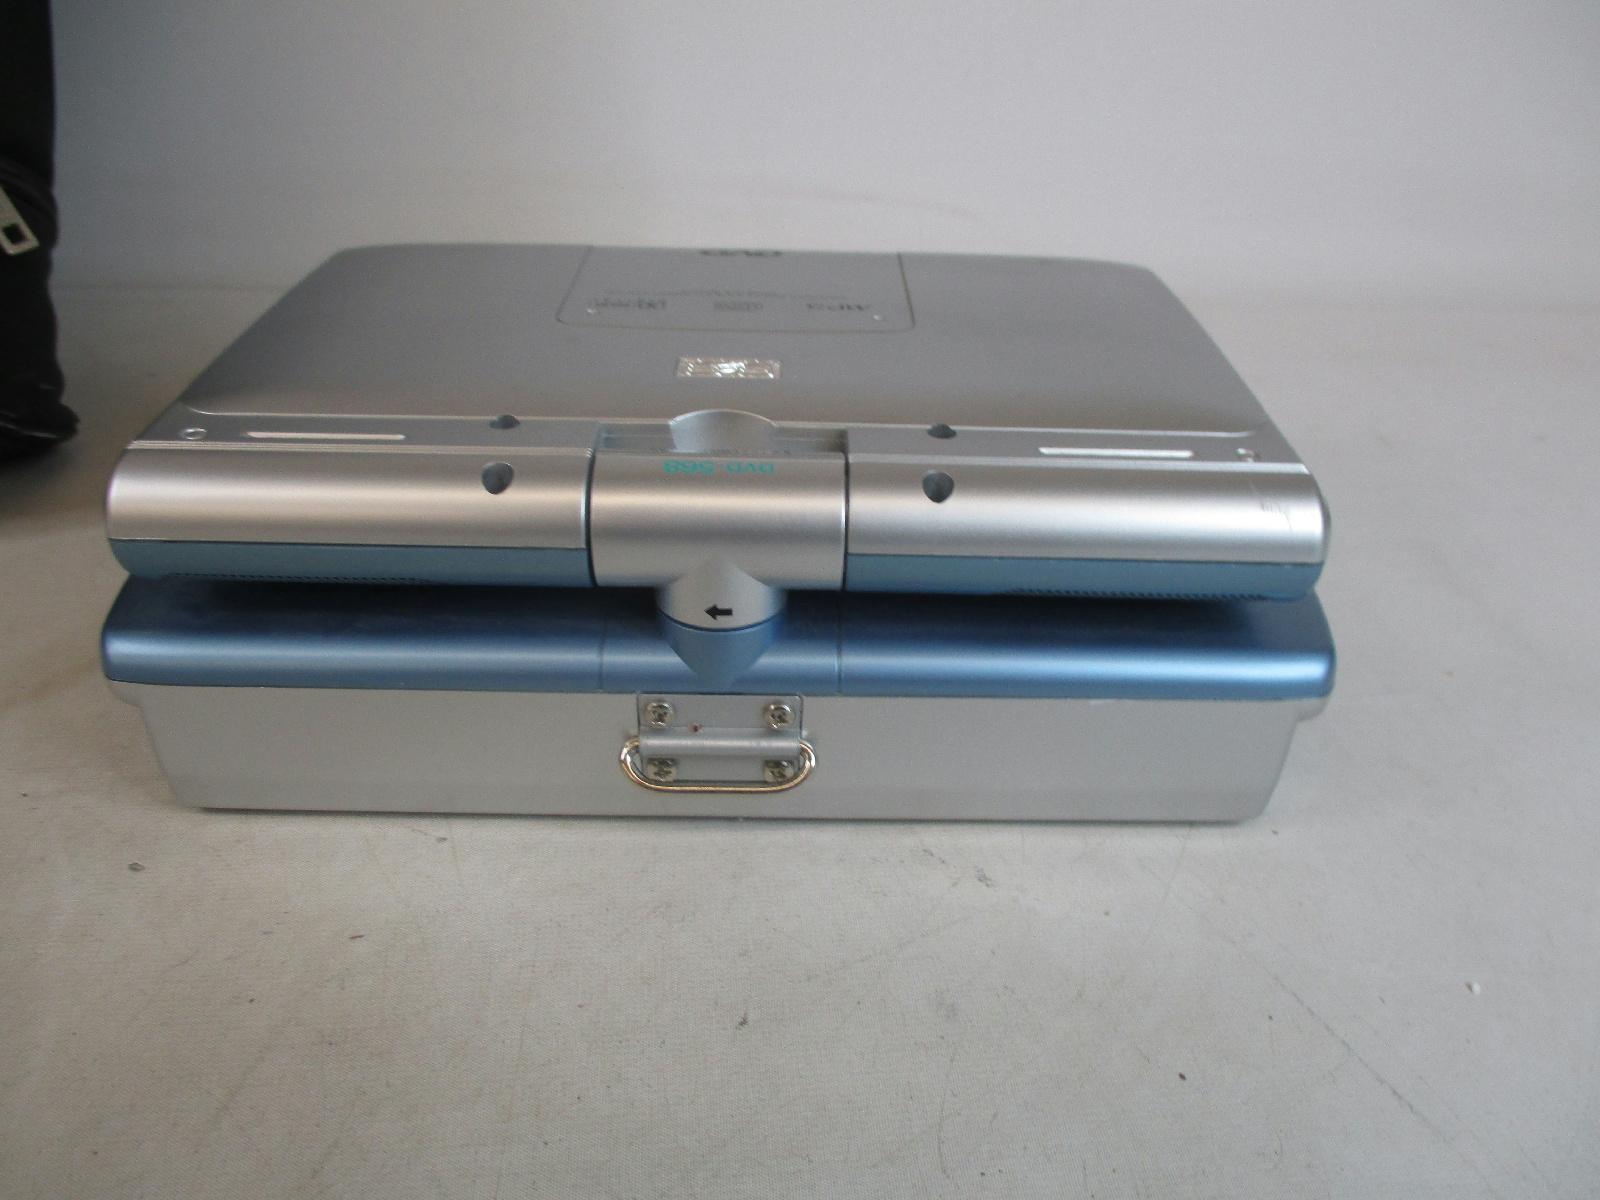 G2g gear portable dvd player